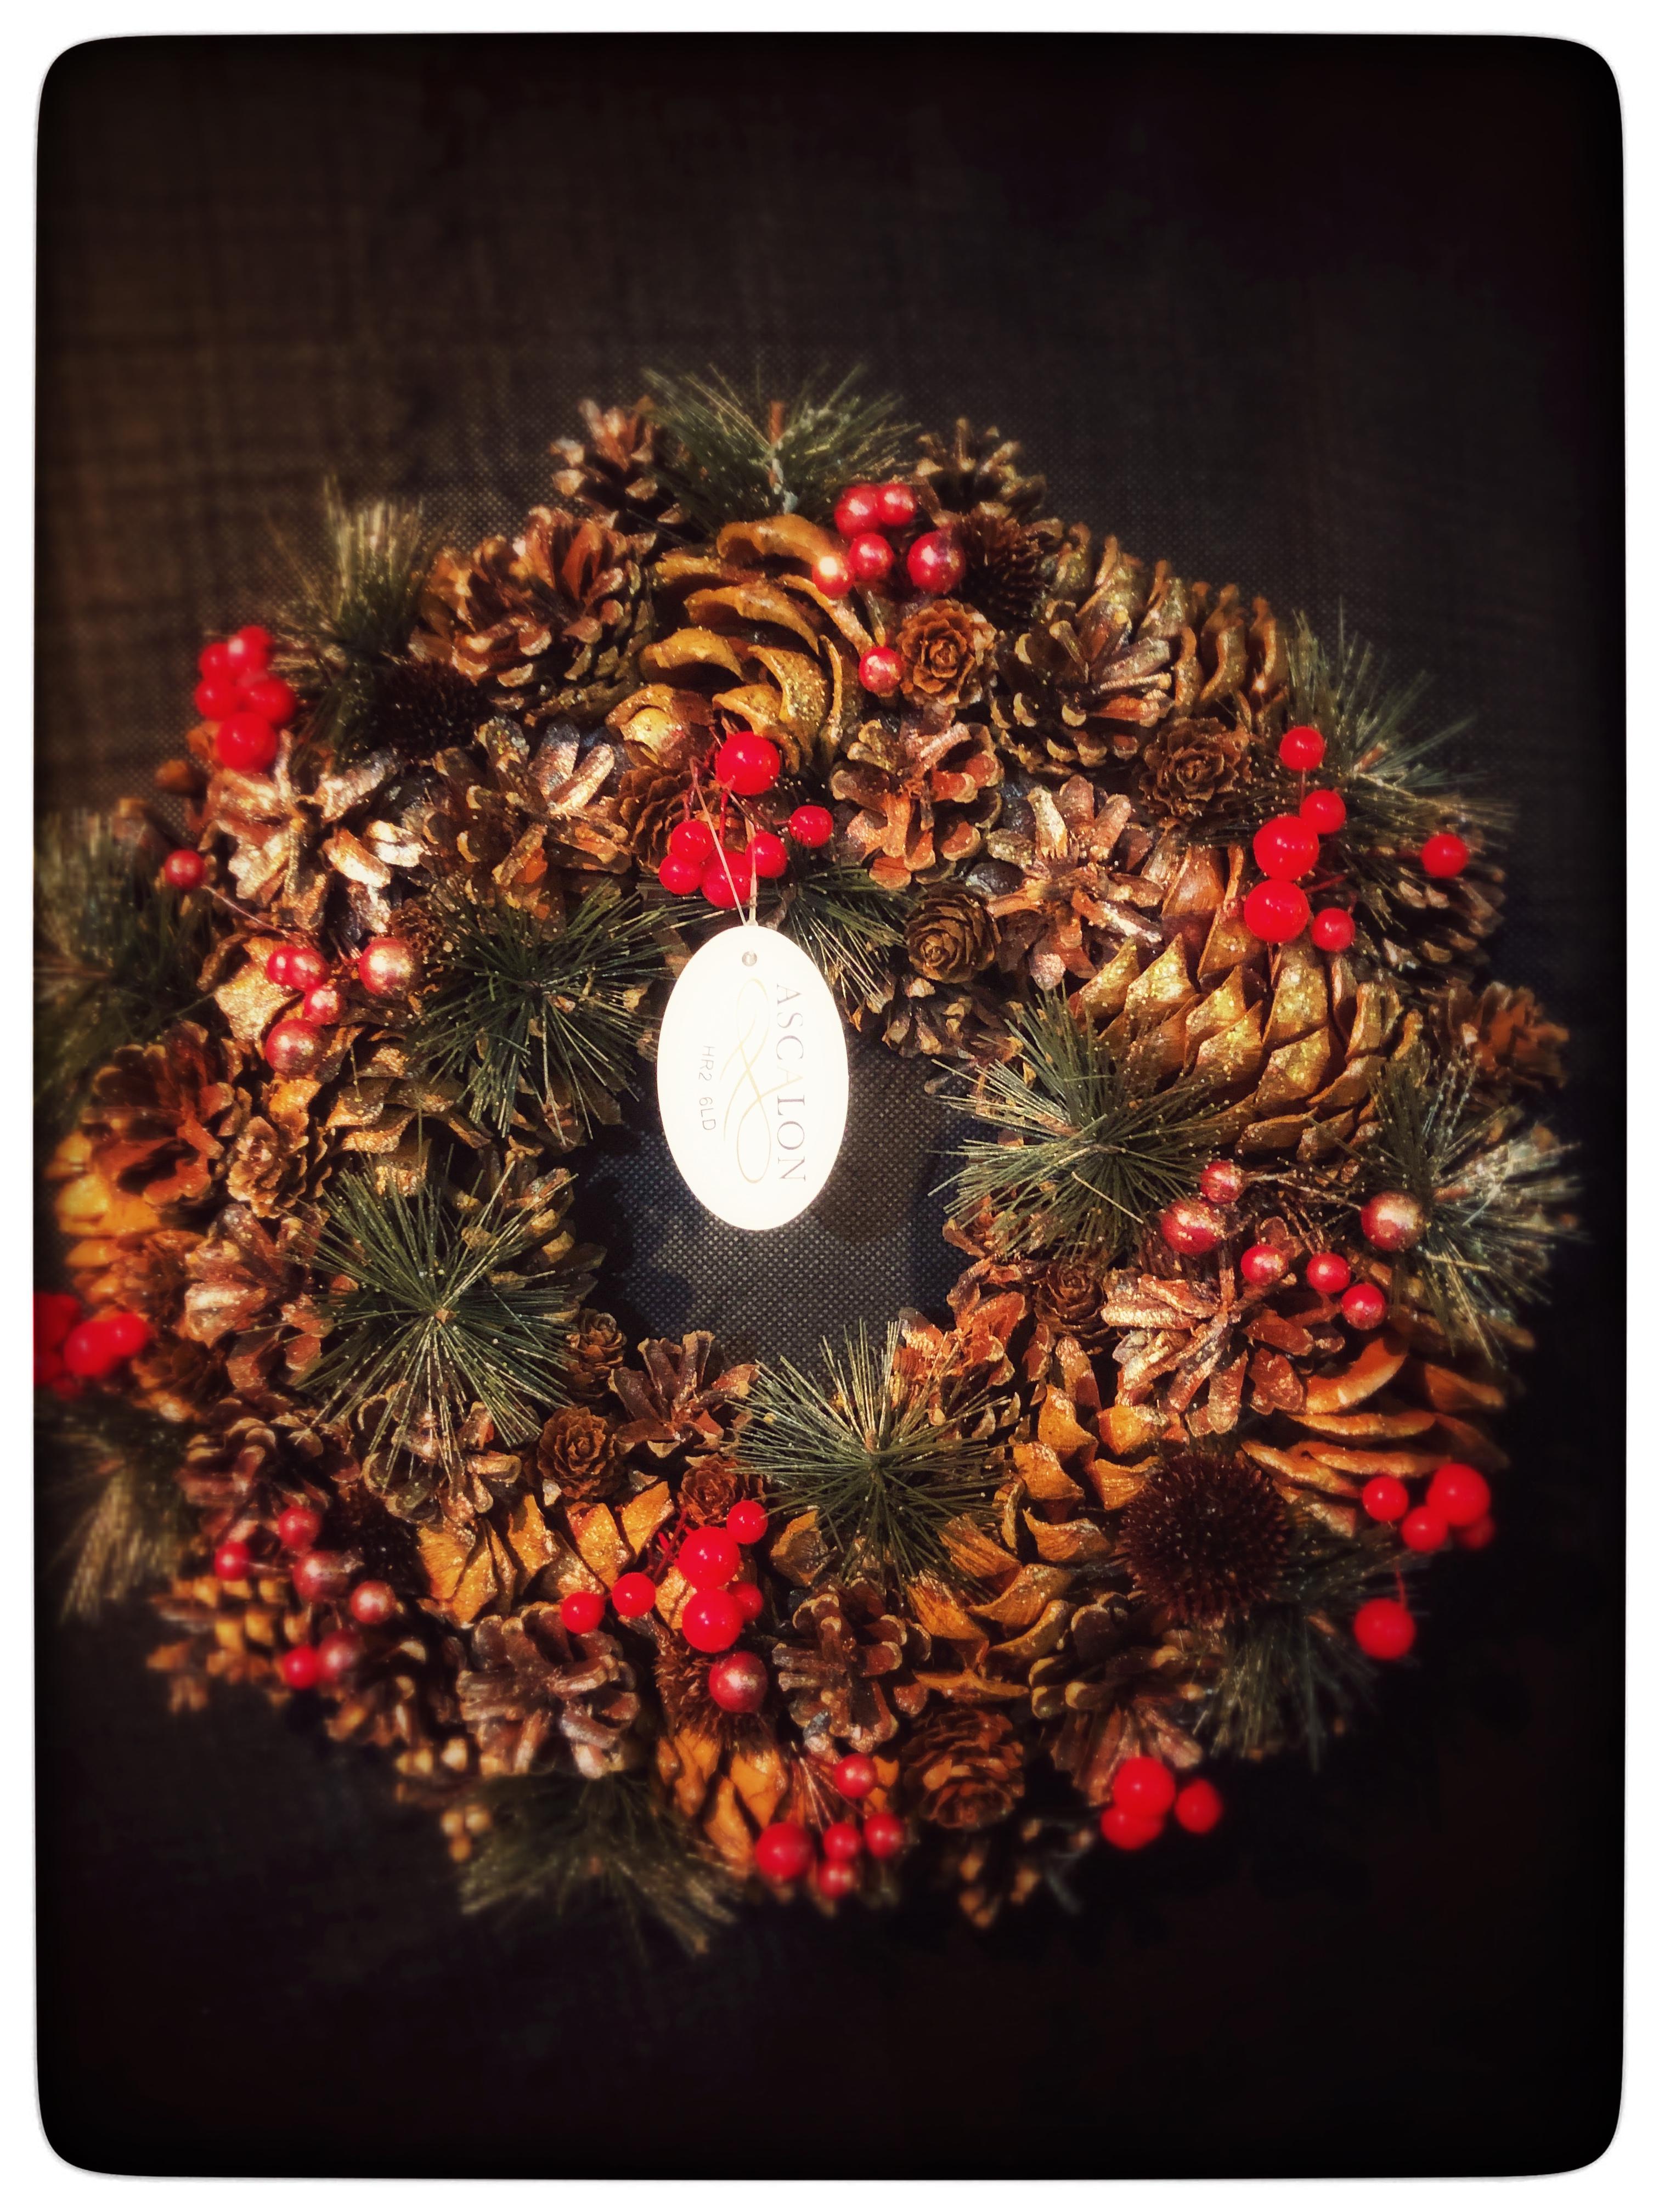 Christmas Shop now open – Seasons Greetings !!